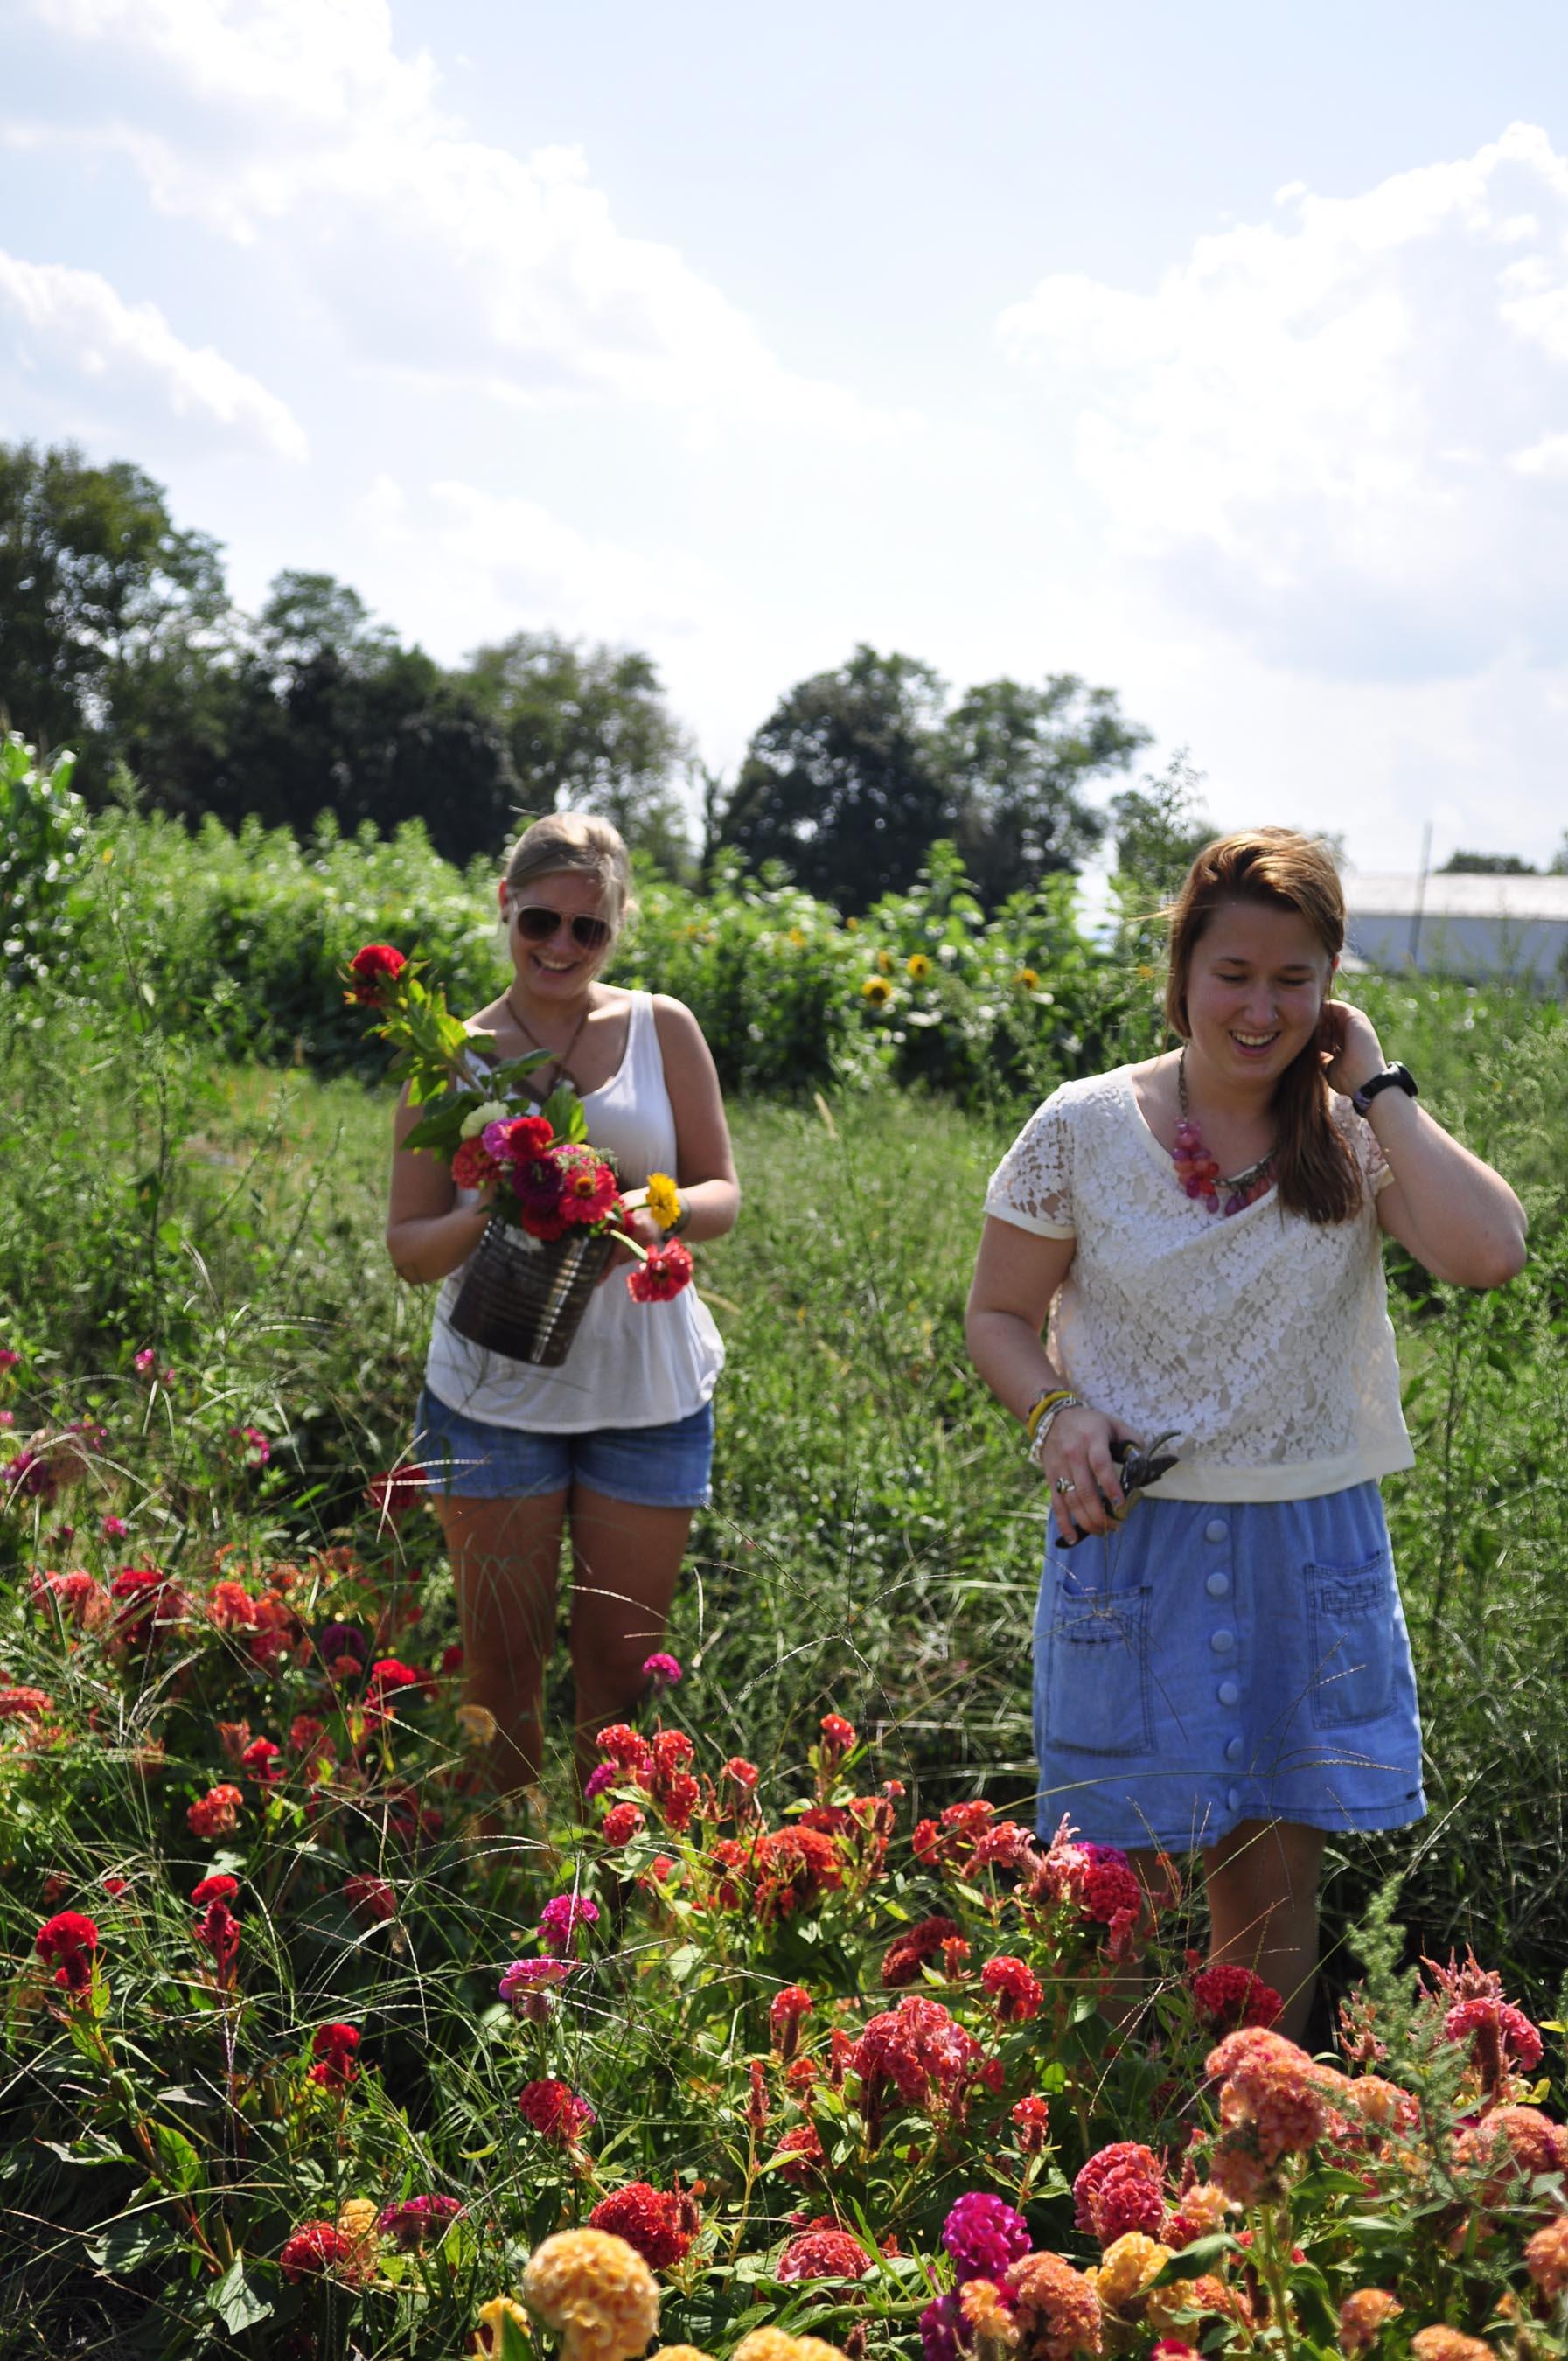 Messiah seniors Lena Karlson and Alina Chapman hand-picking flowers at Paulus Farm Market.